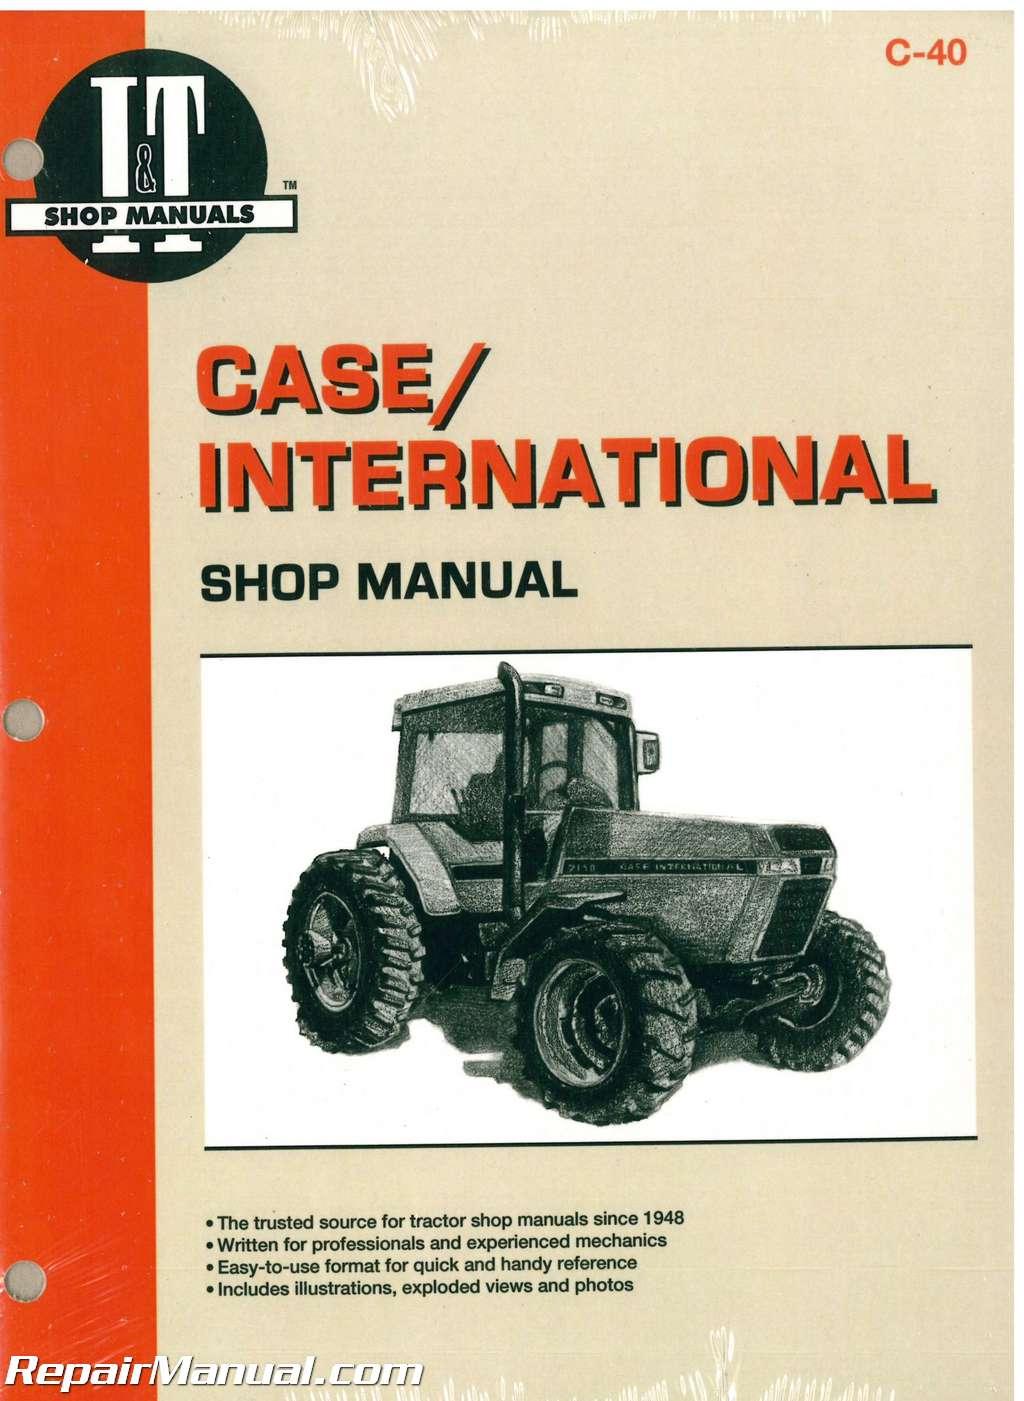 Case International 7110 7120 7130 7140 Tractor Workshop Manual   C